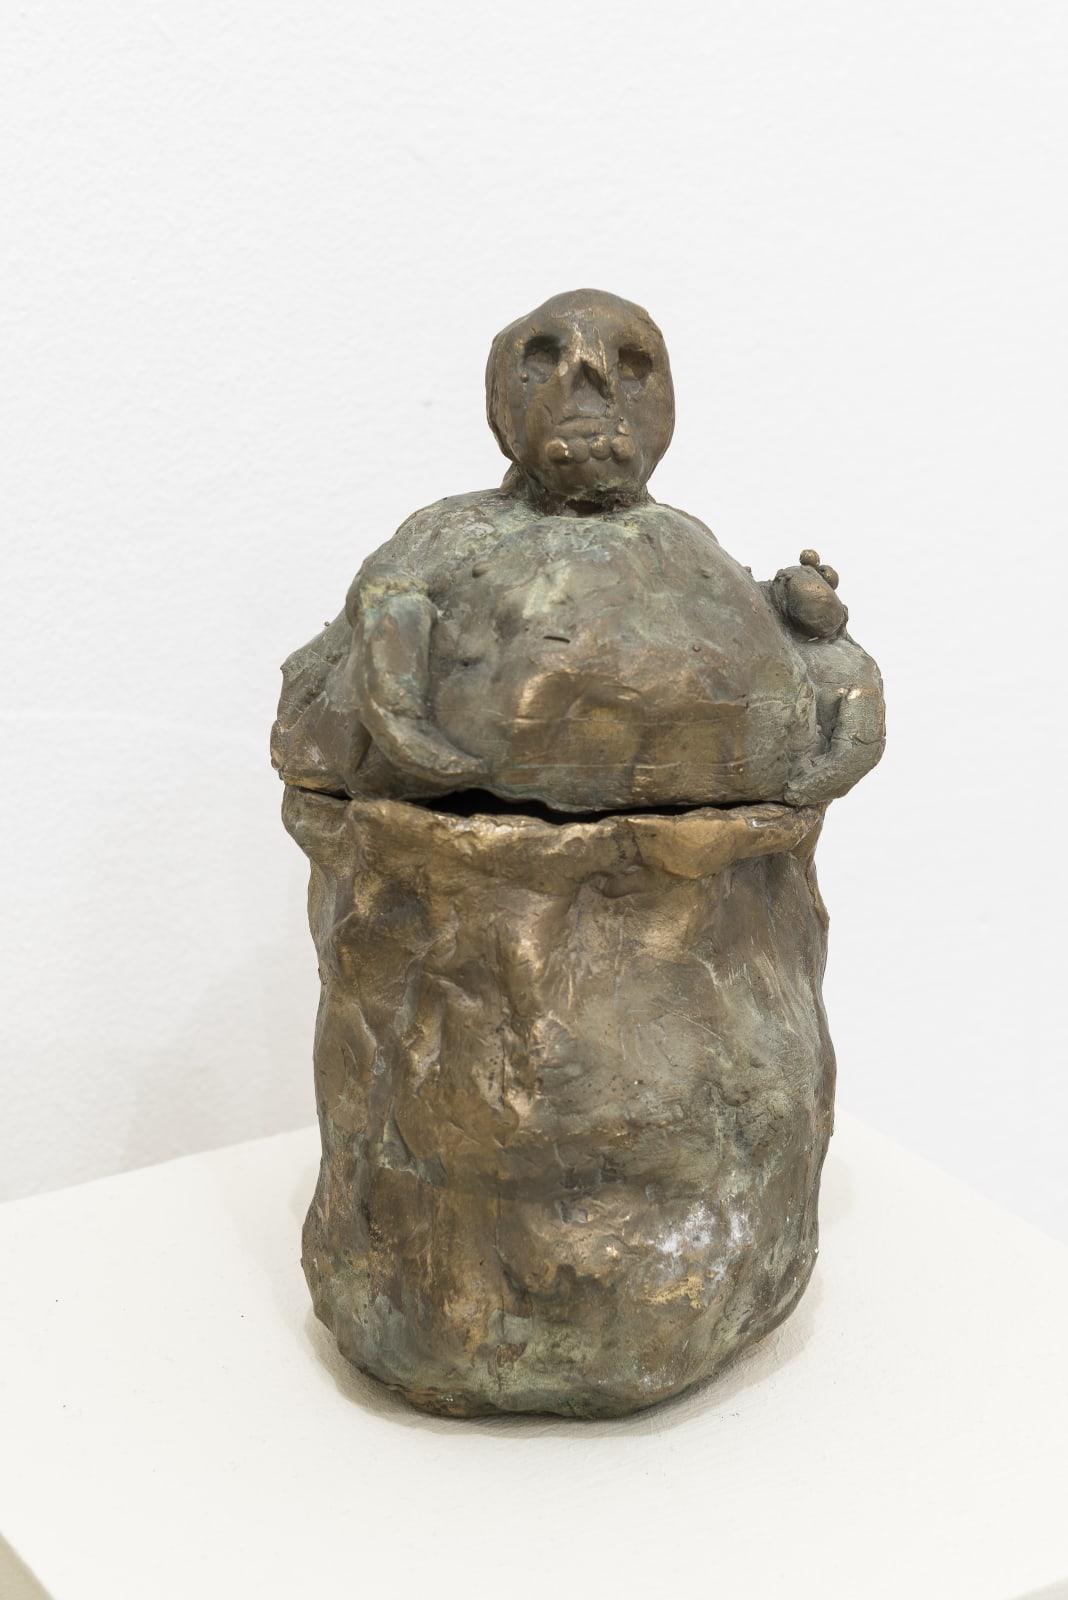 Evgeny Antufiev, Untitled, 2015, brass sculpture, cm 22 x 11 x 09